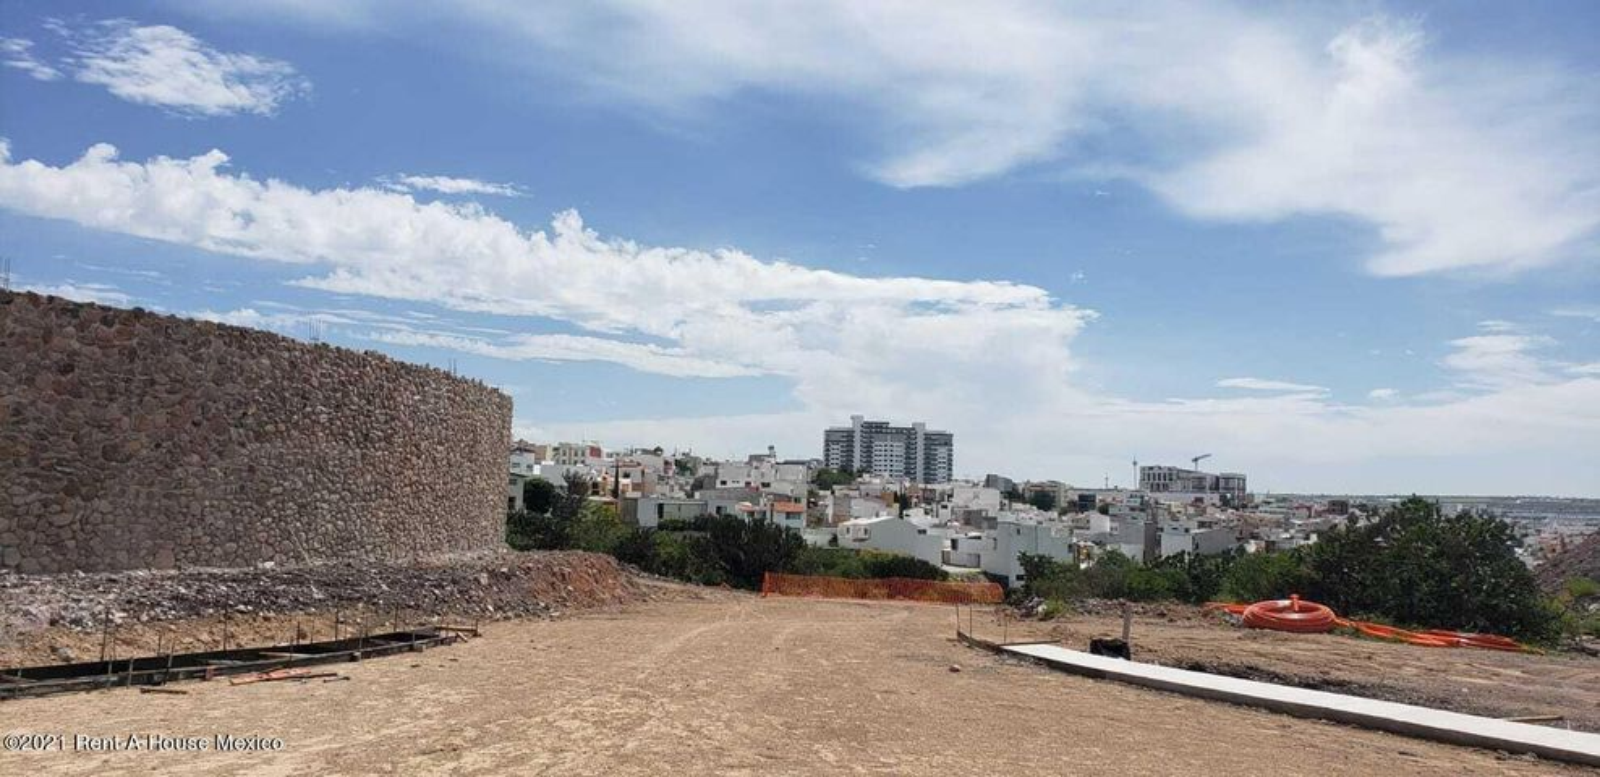 Terreno Queretaro>Queretaro>Loma Dorada - Venta:1.756.188 Pesos - codigo: 22-670